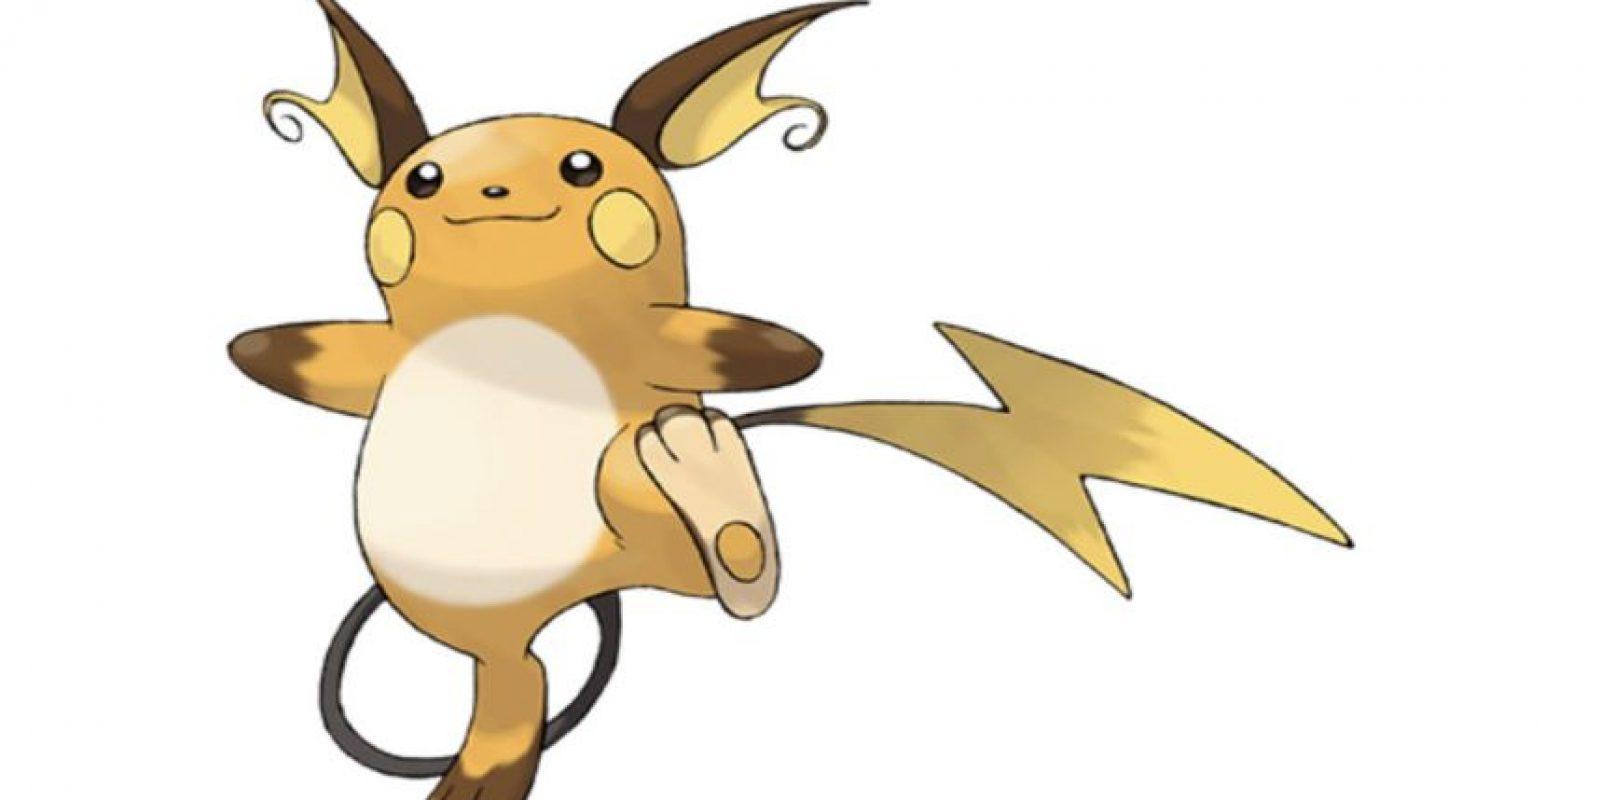 Raichu Foto:Pokémon